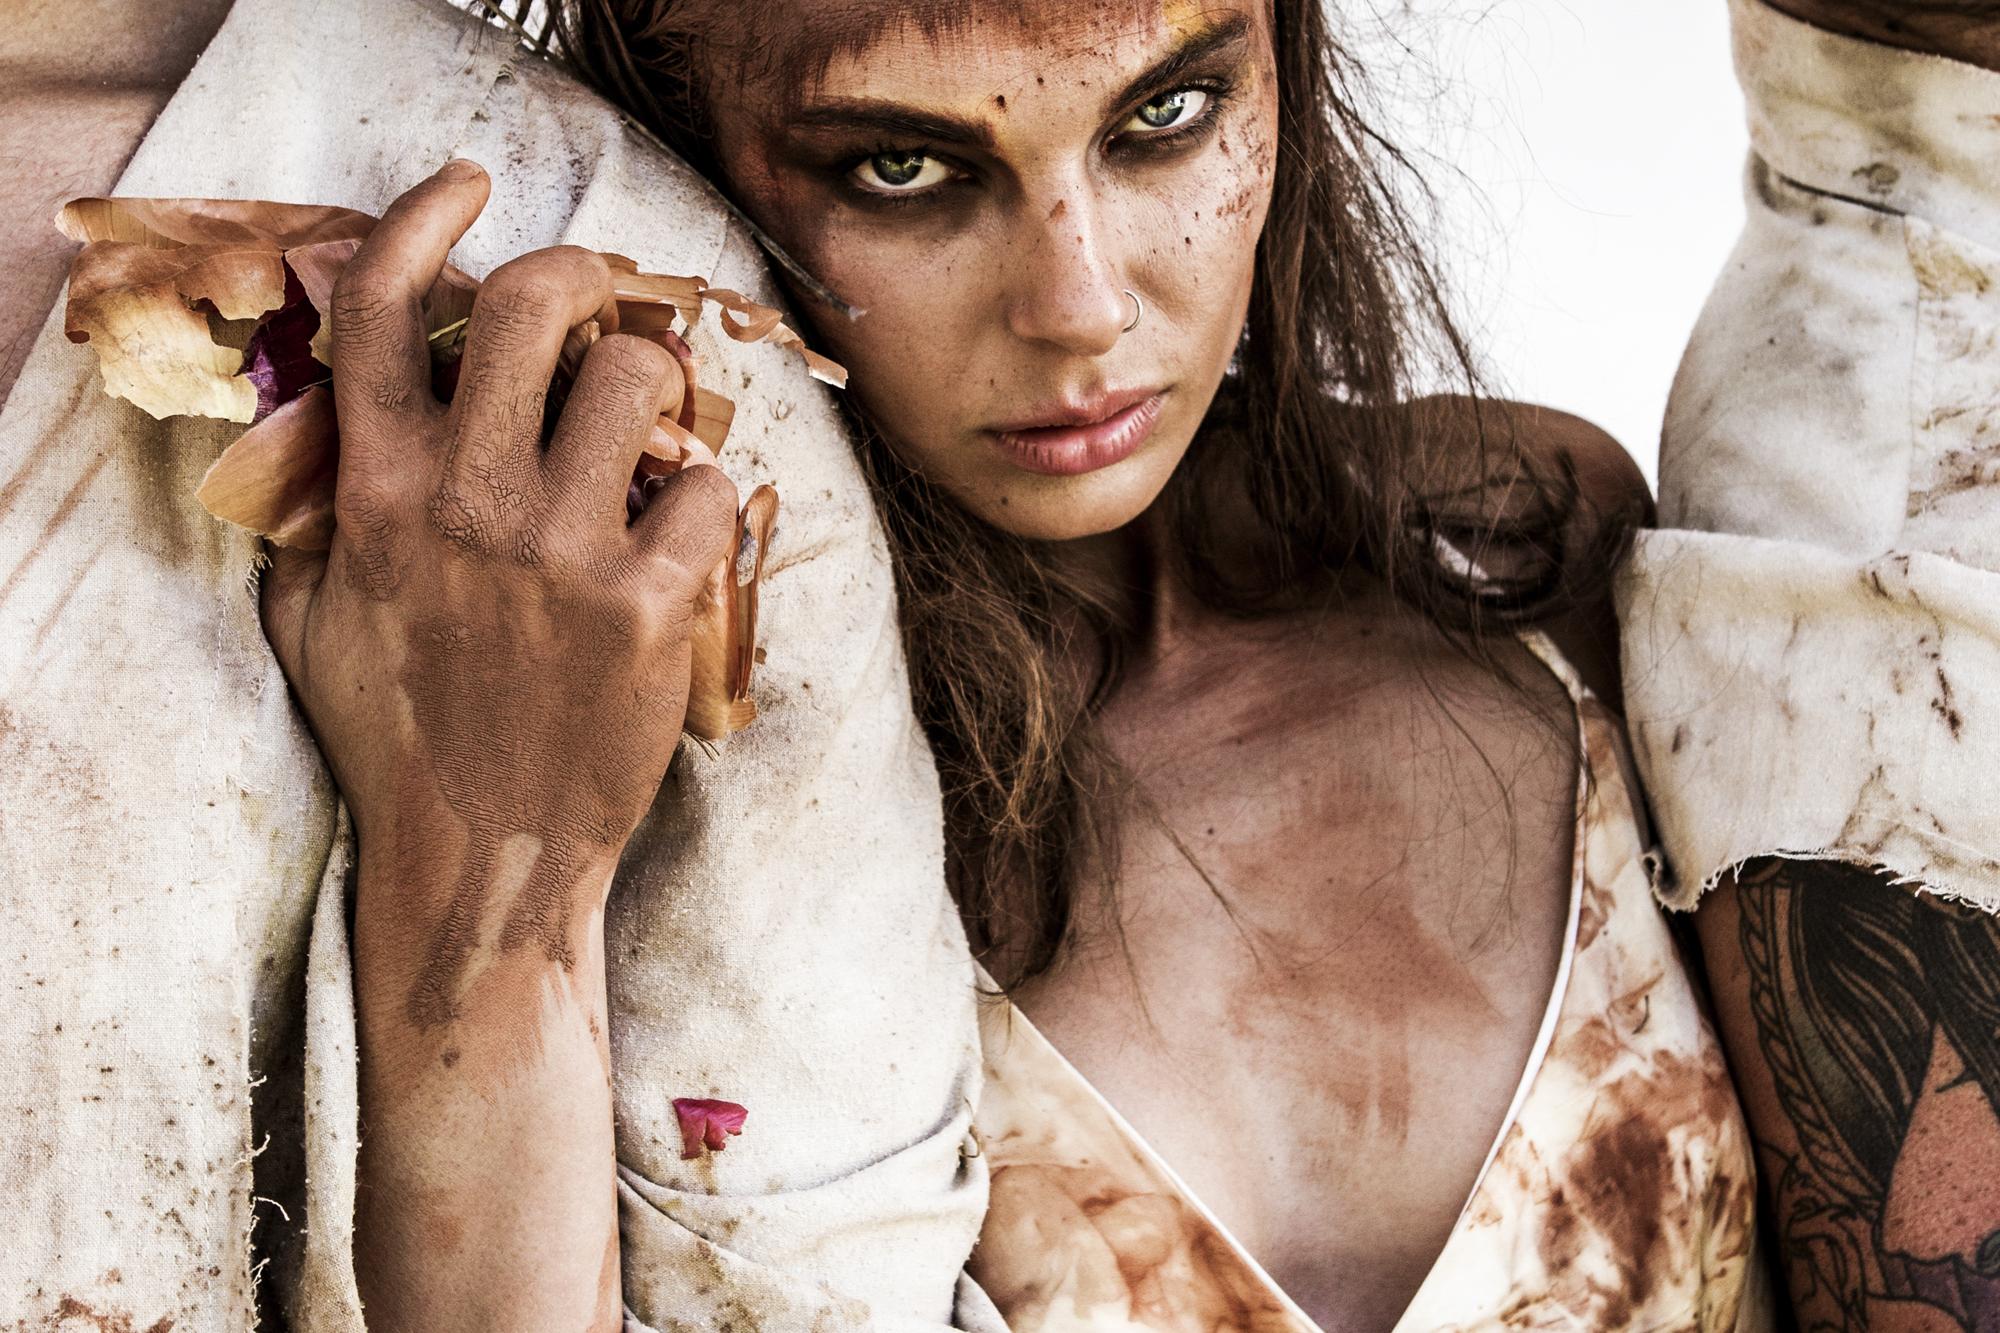 beautiful fashion art model portrait donatella parisini photography